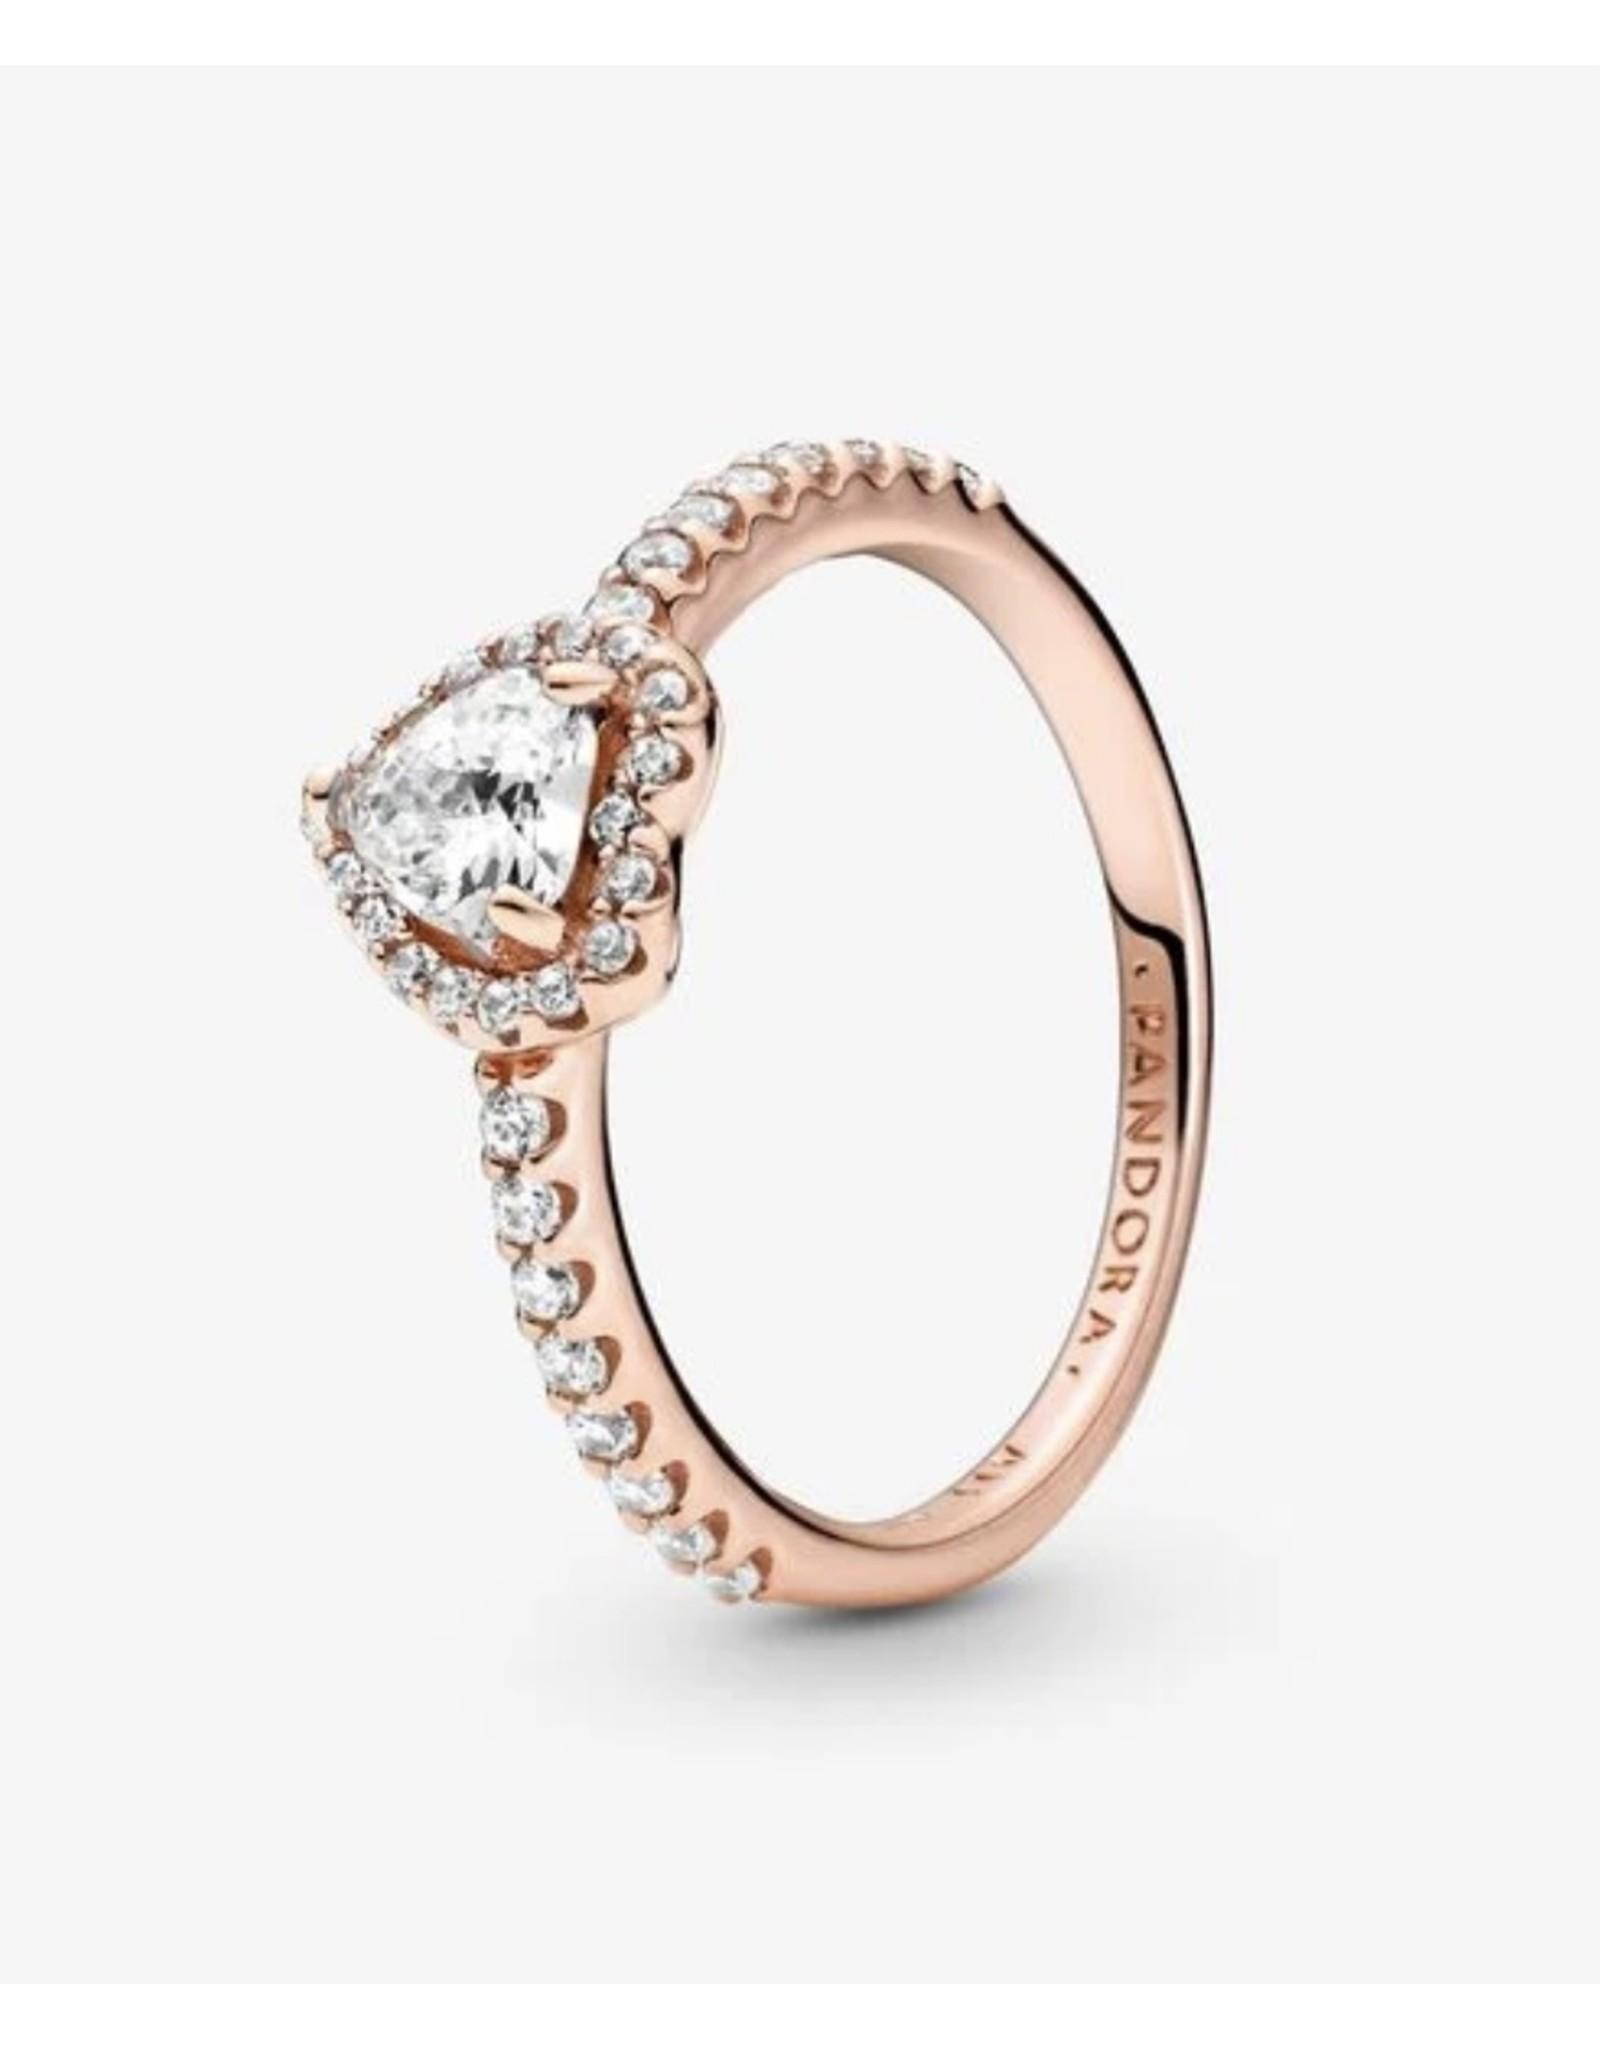 Pandora Pandora Ring,188421C02,Sparkling Elevated Heart, Clear CZ, Rose Gold